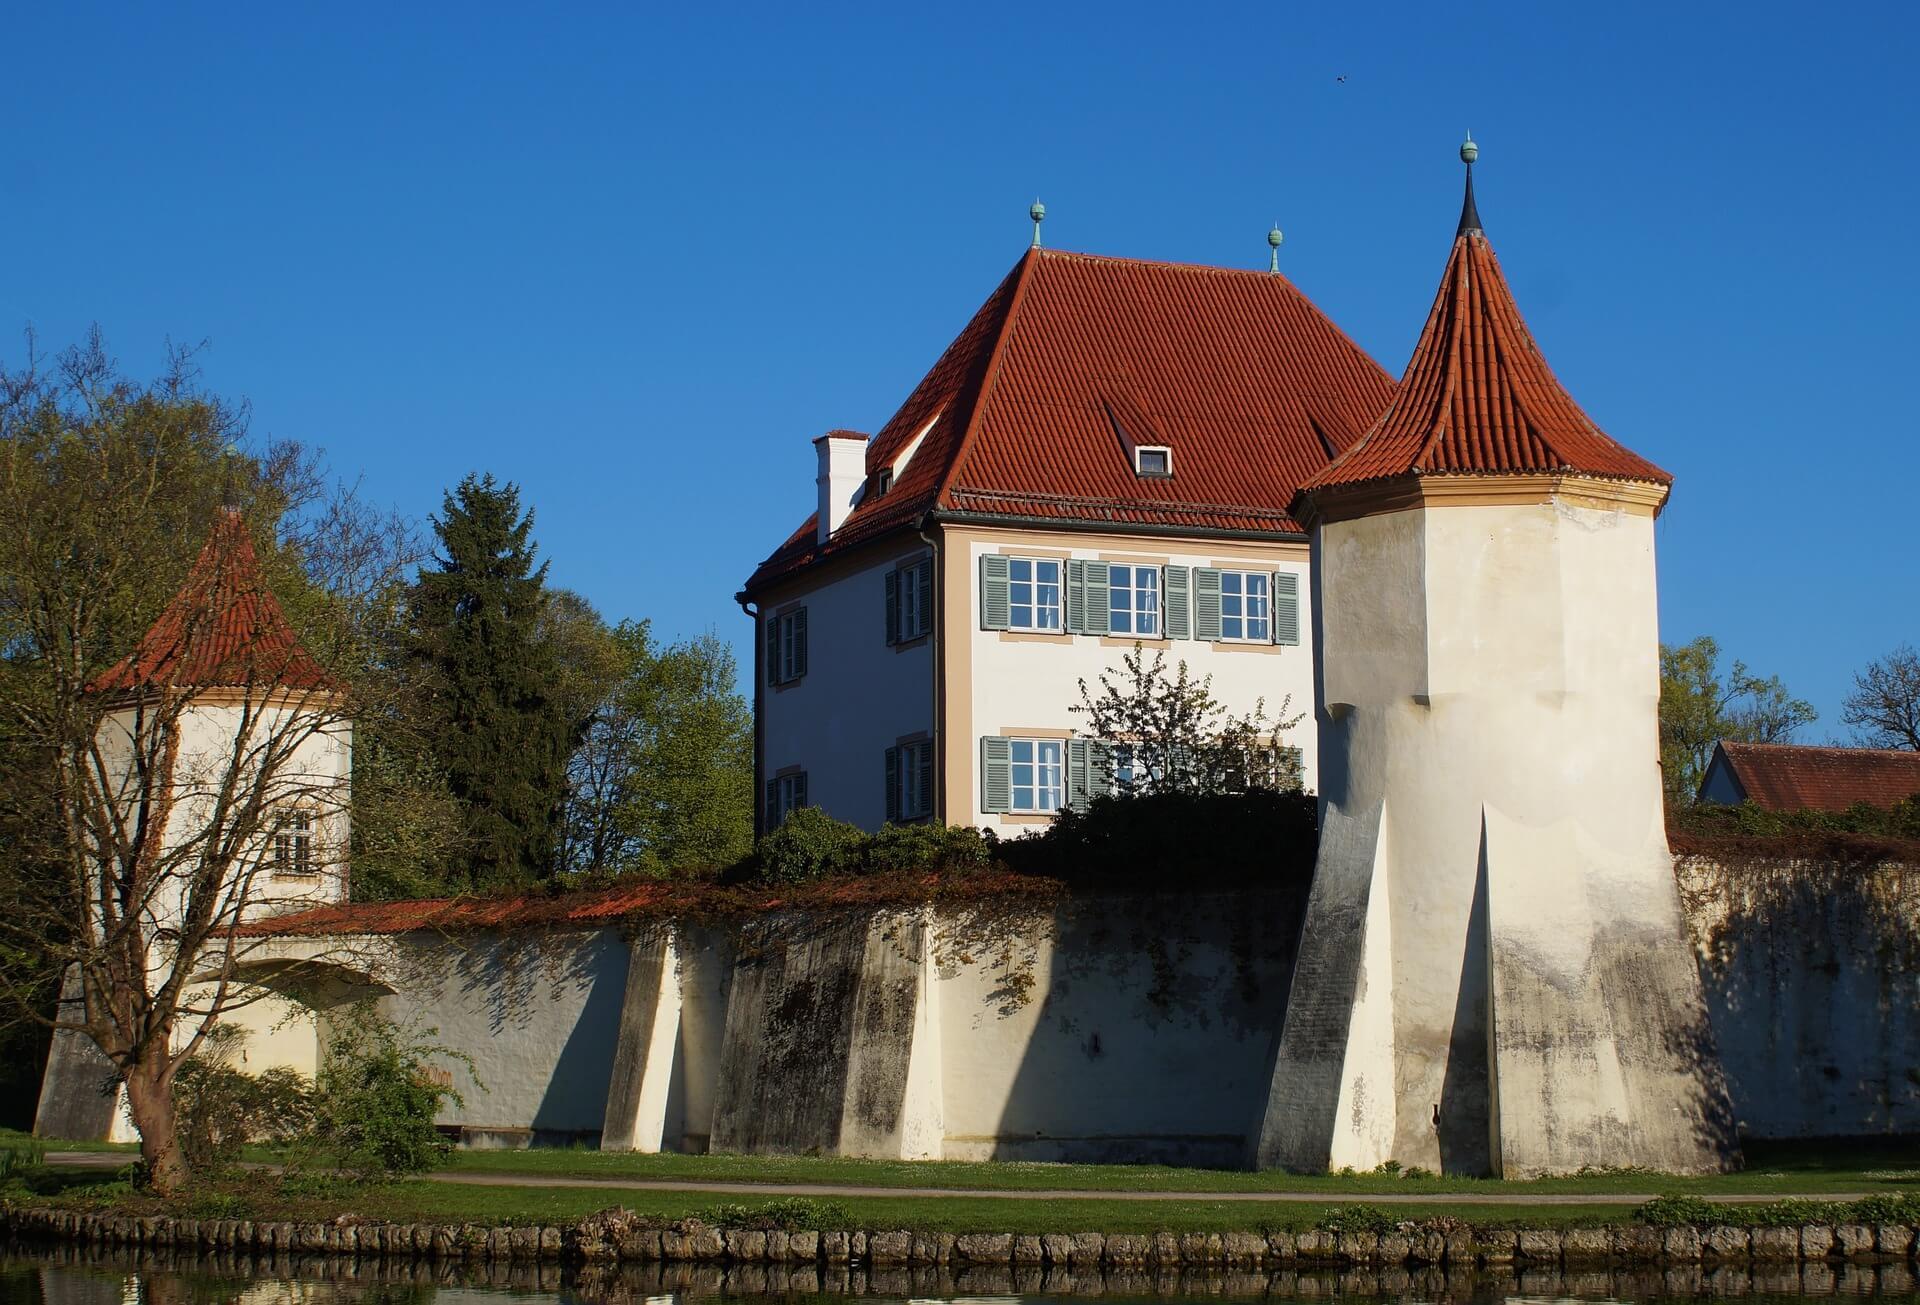 Obermenzinger Blutenburg